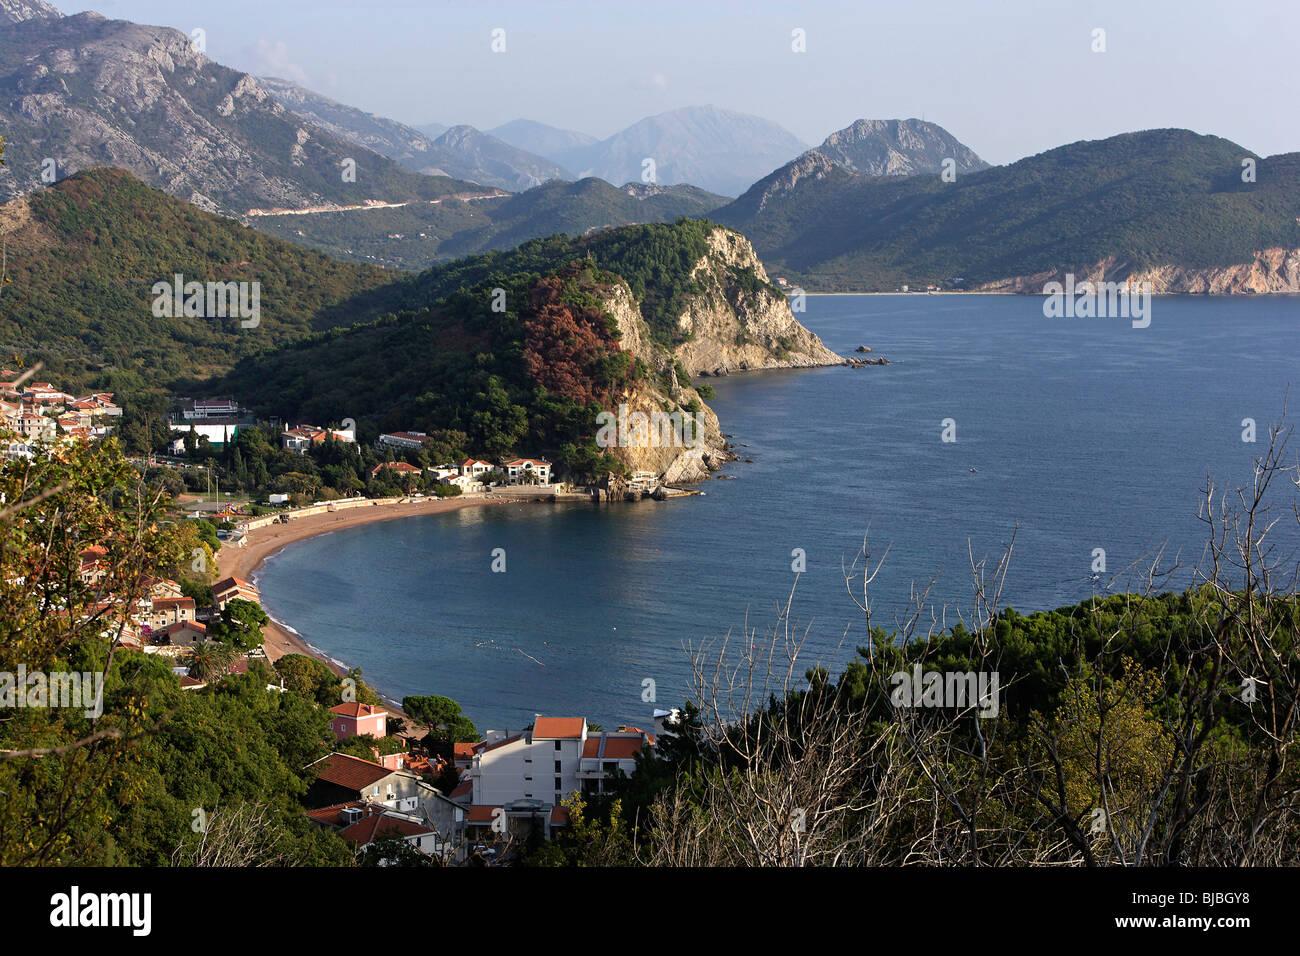 Petrovac,Adriatic coast,Montenegro - Stock Image